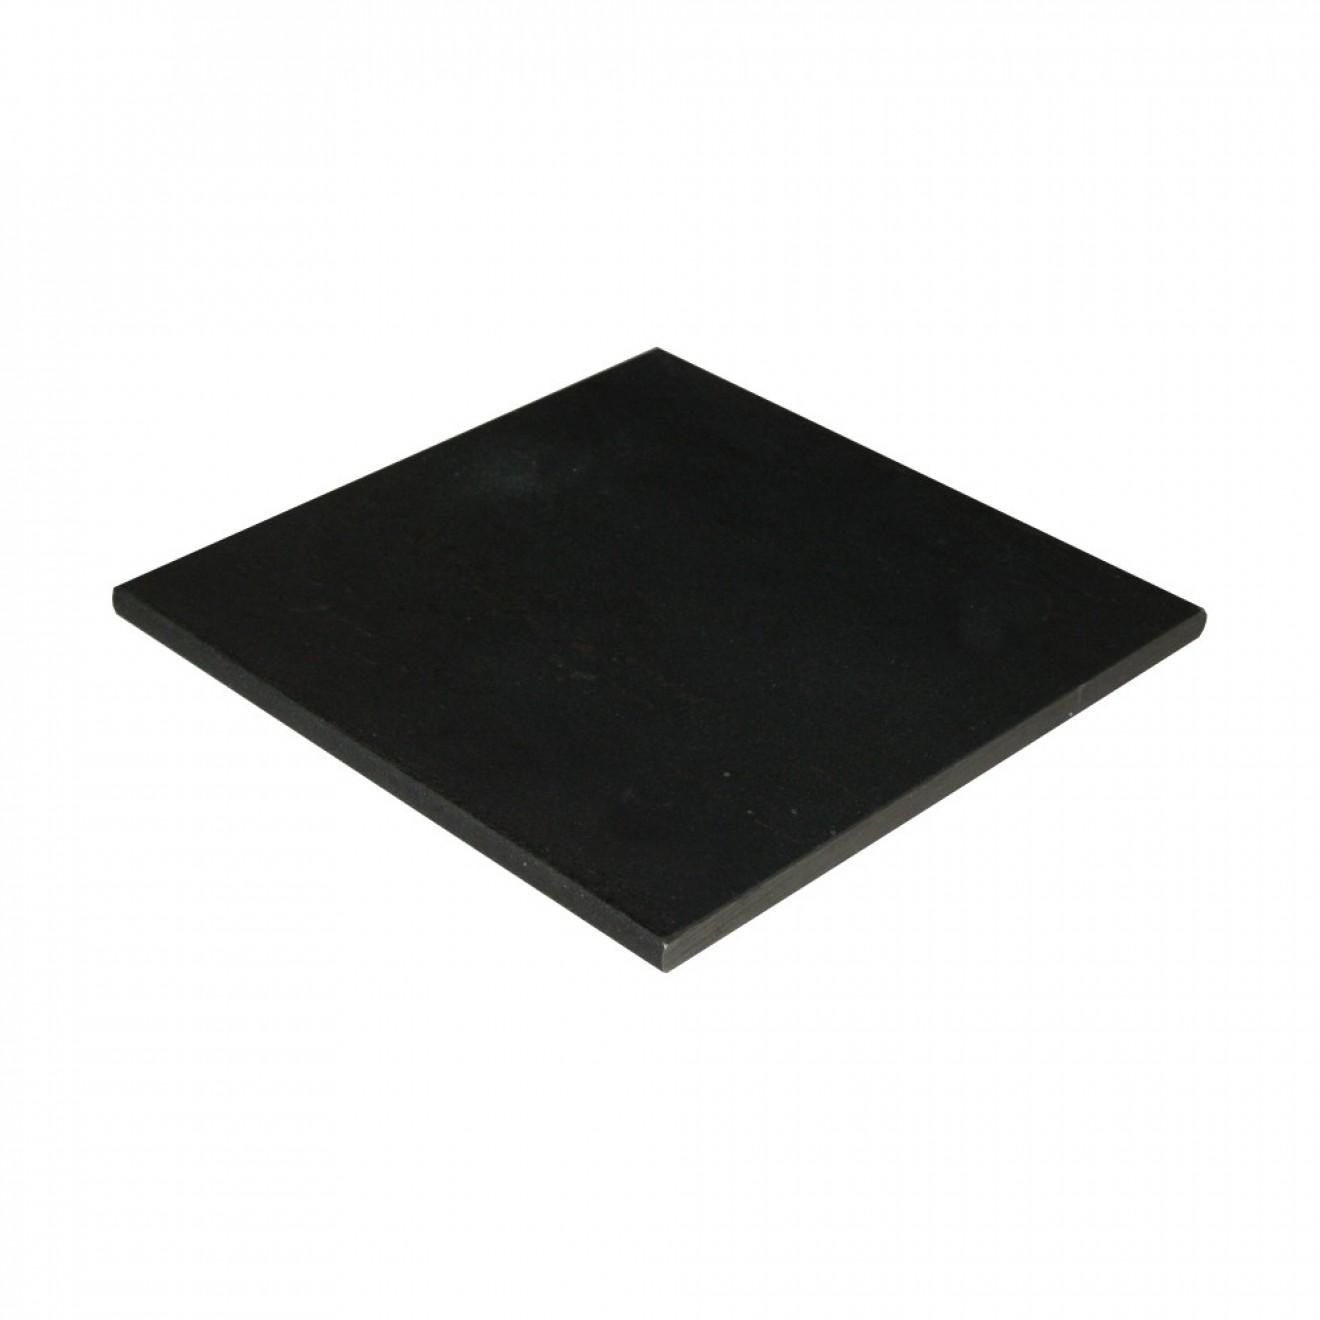 stahlplatte stahlblech fu platte kopfplatte bech. Black Bedroom Furniture Sets. Home Design Ideas